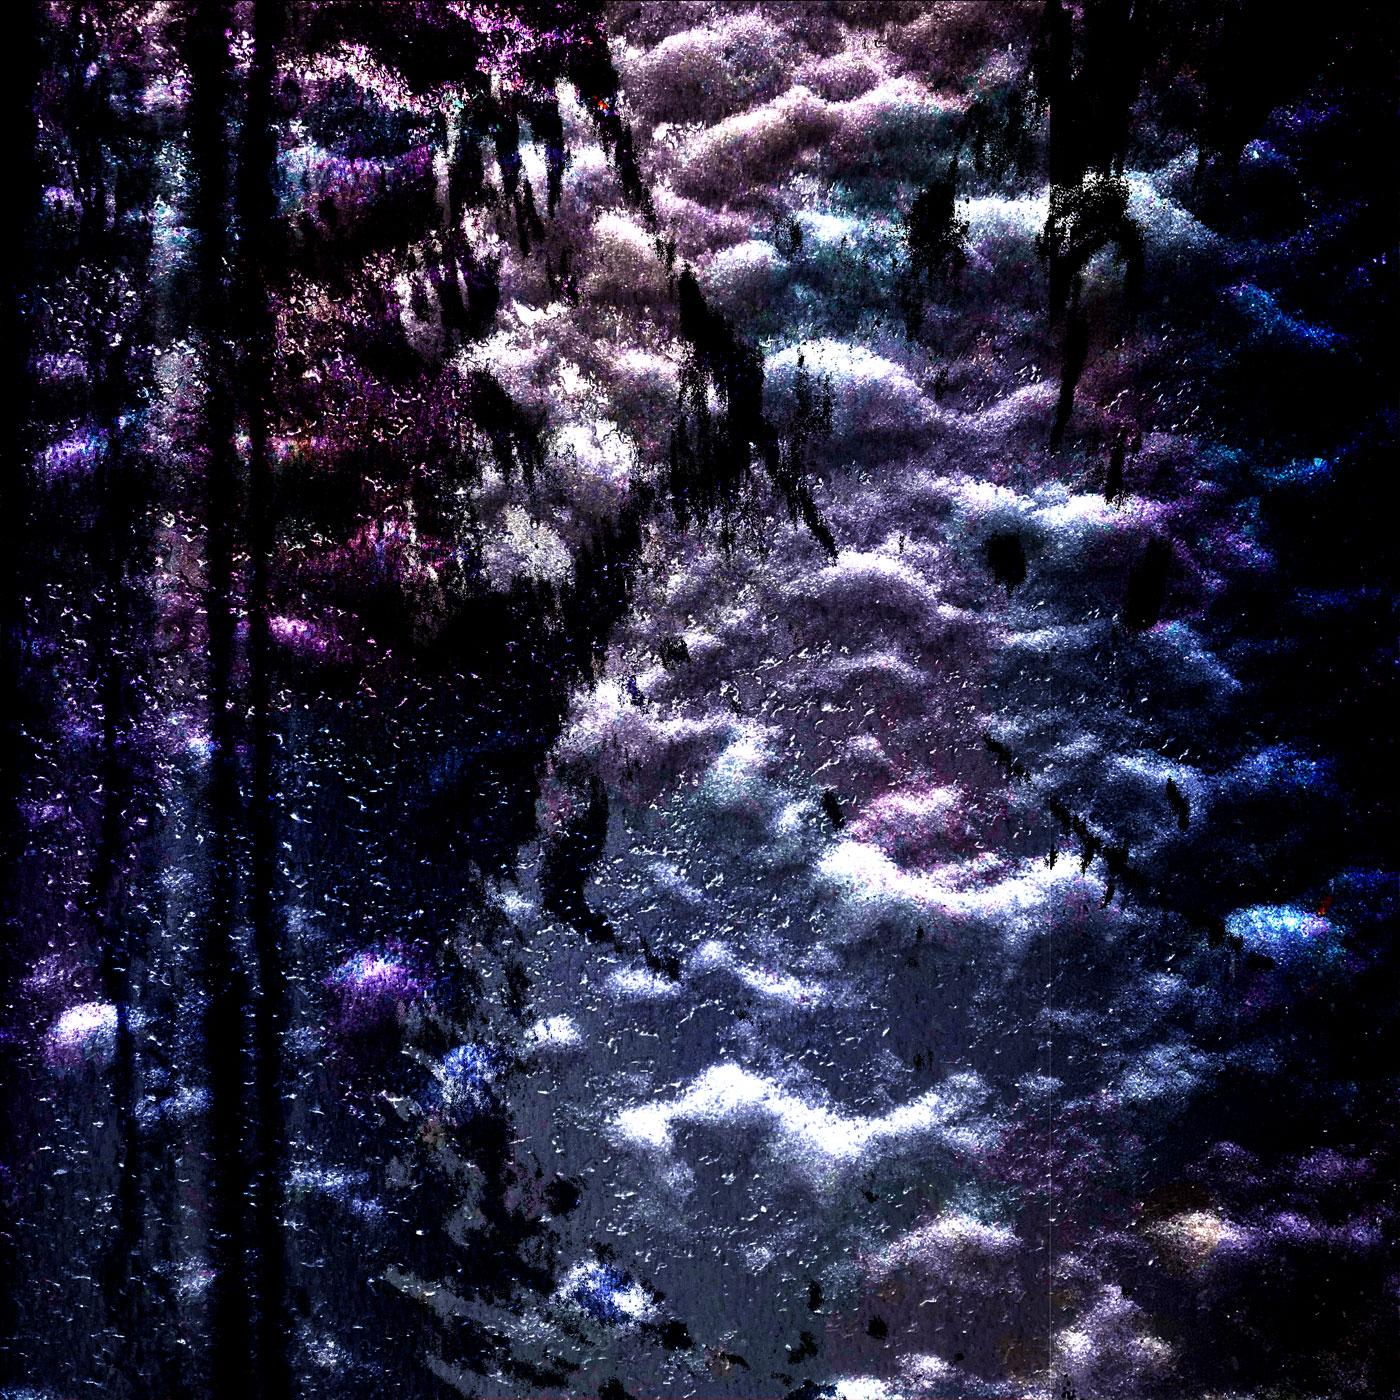 Elemental Frost N05 - Stars • 90 x 90 cm (35.43 x 35.43 in)